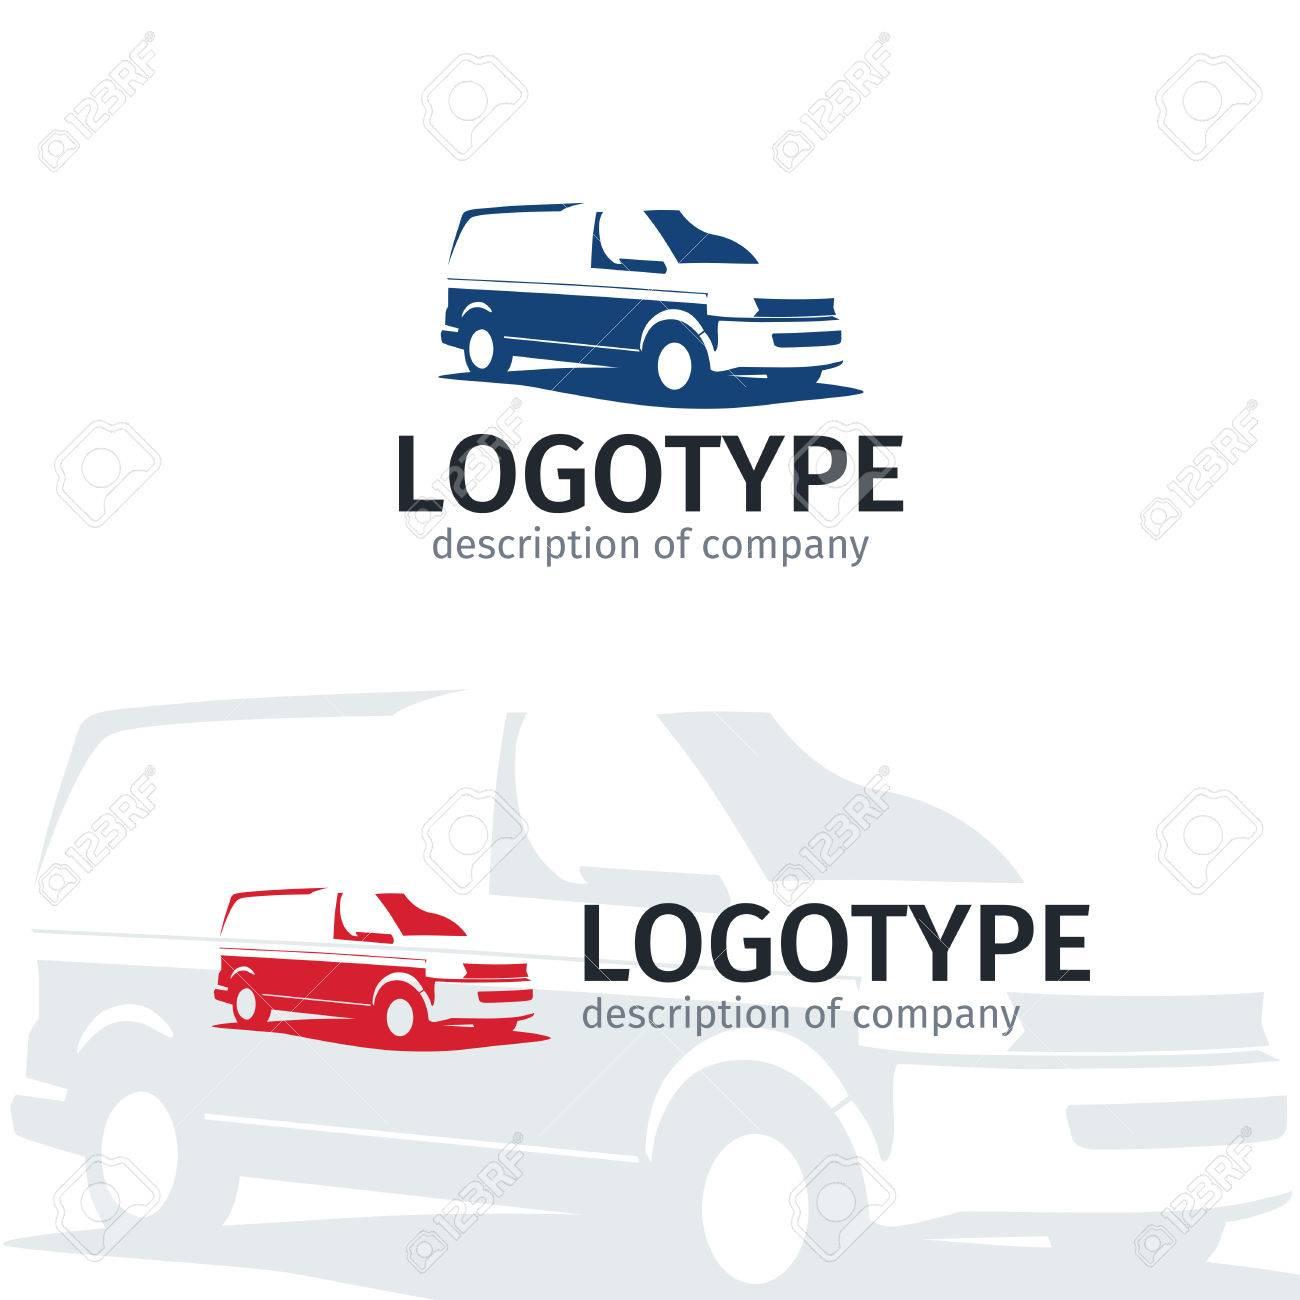 Car repair or delivery service label. Vector logo design template. Concept for automobile repair service, spare parts store. - 84037573